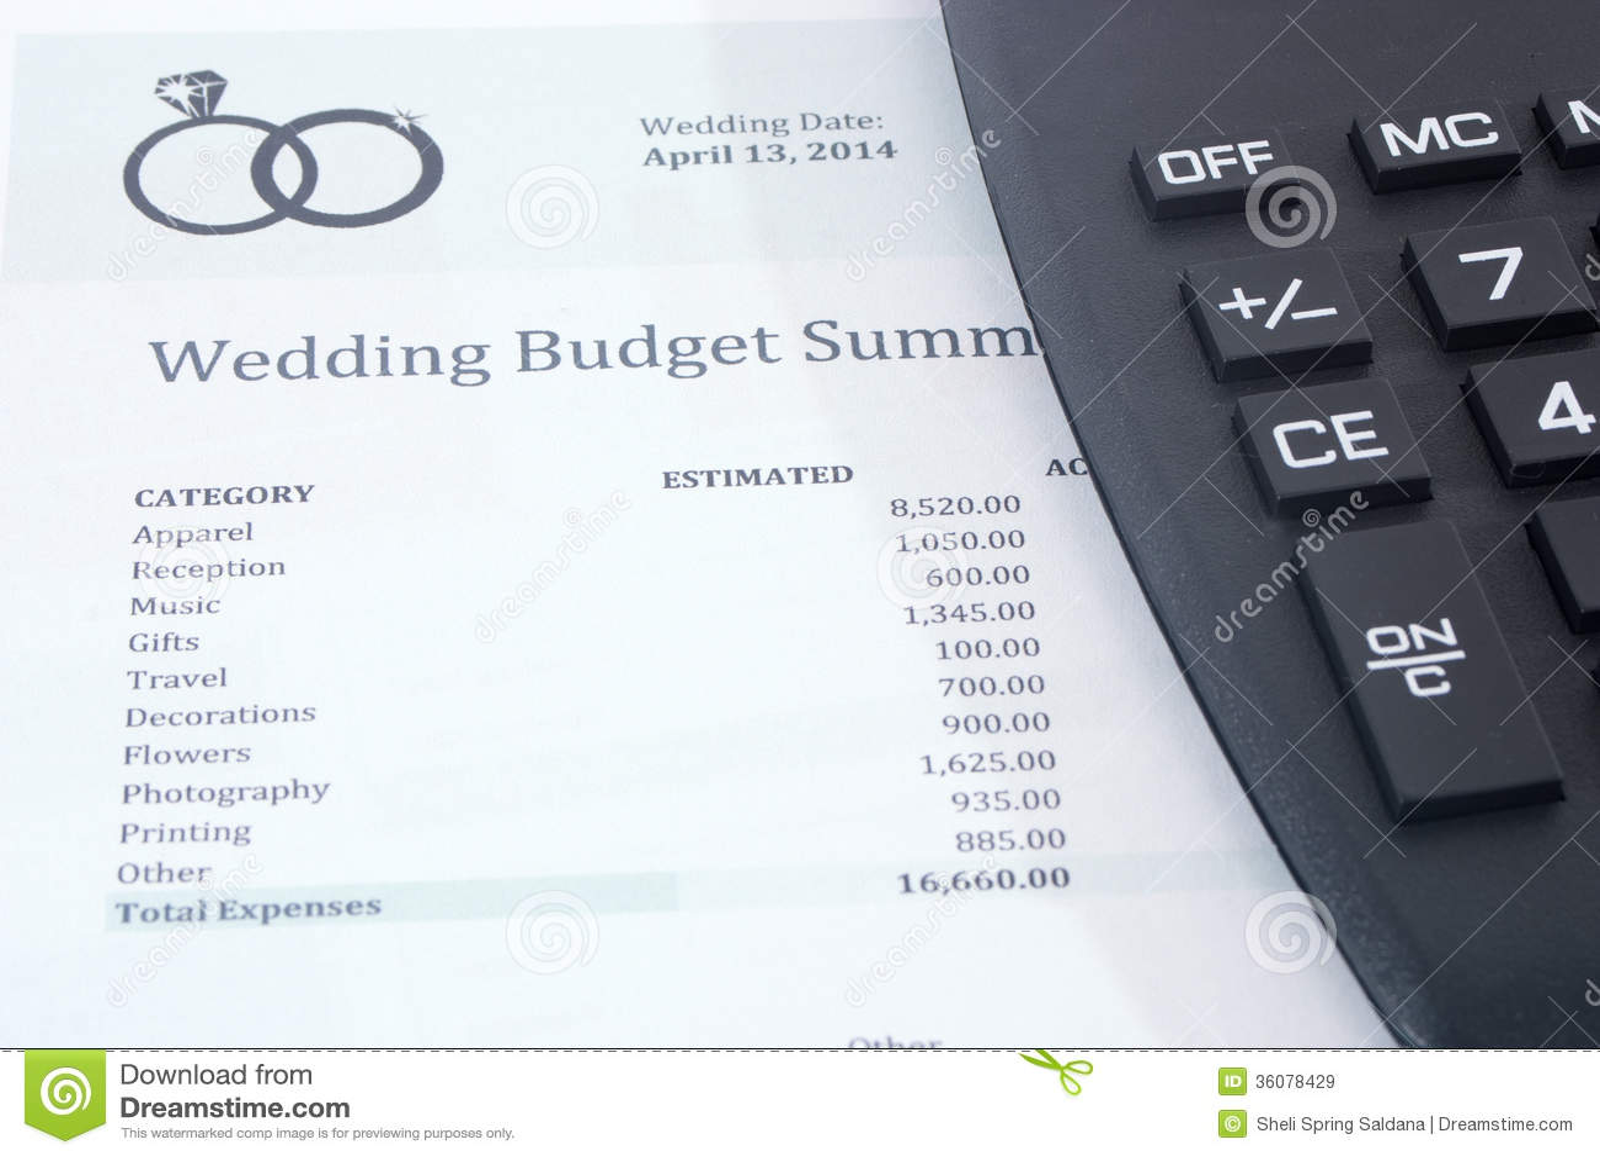 wedding planning budget calculator